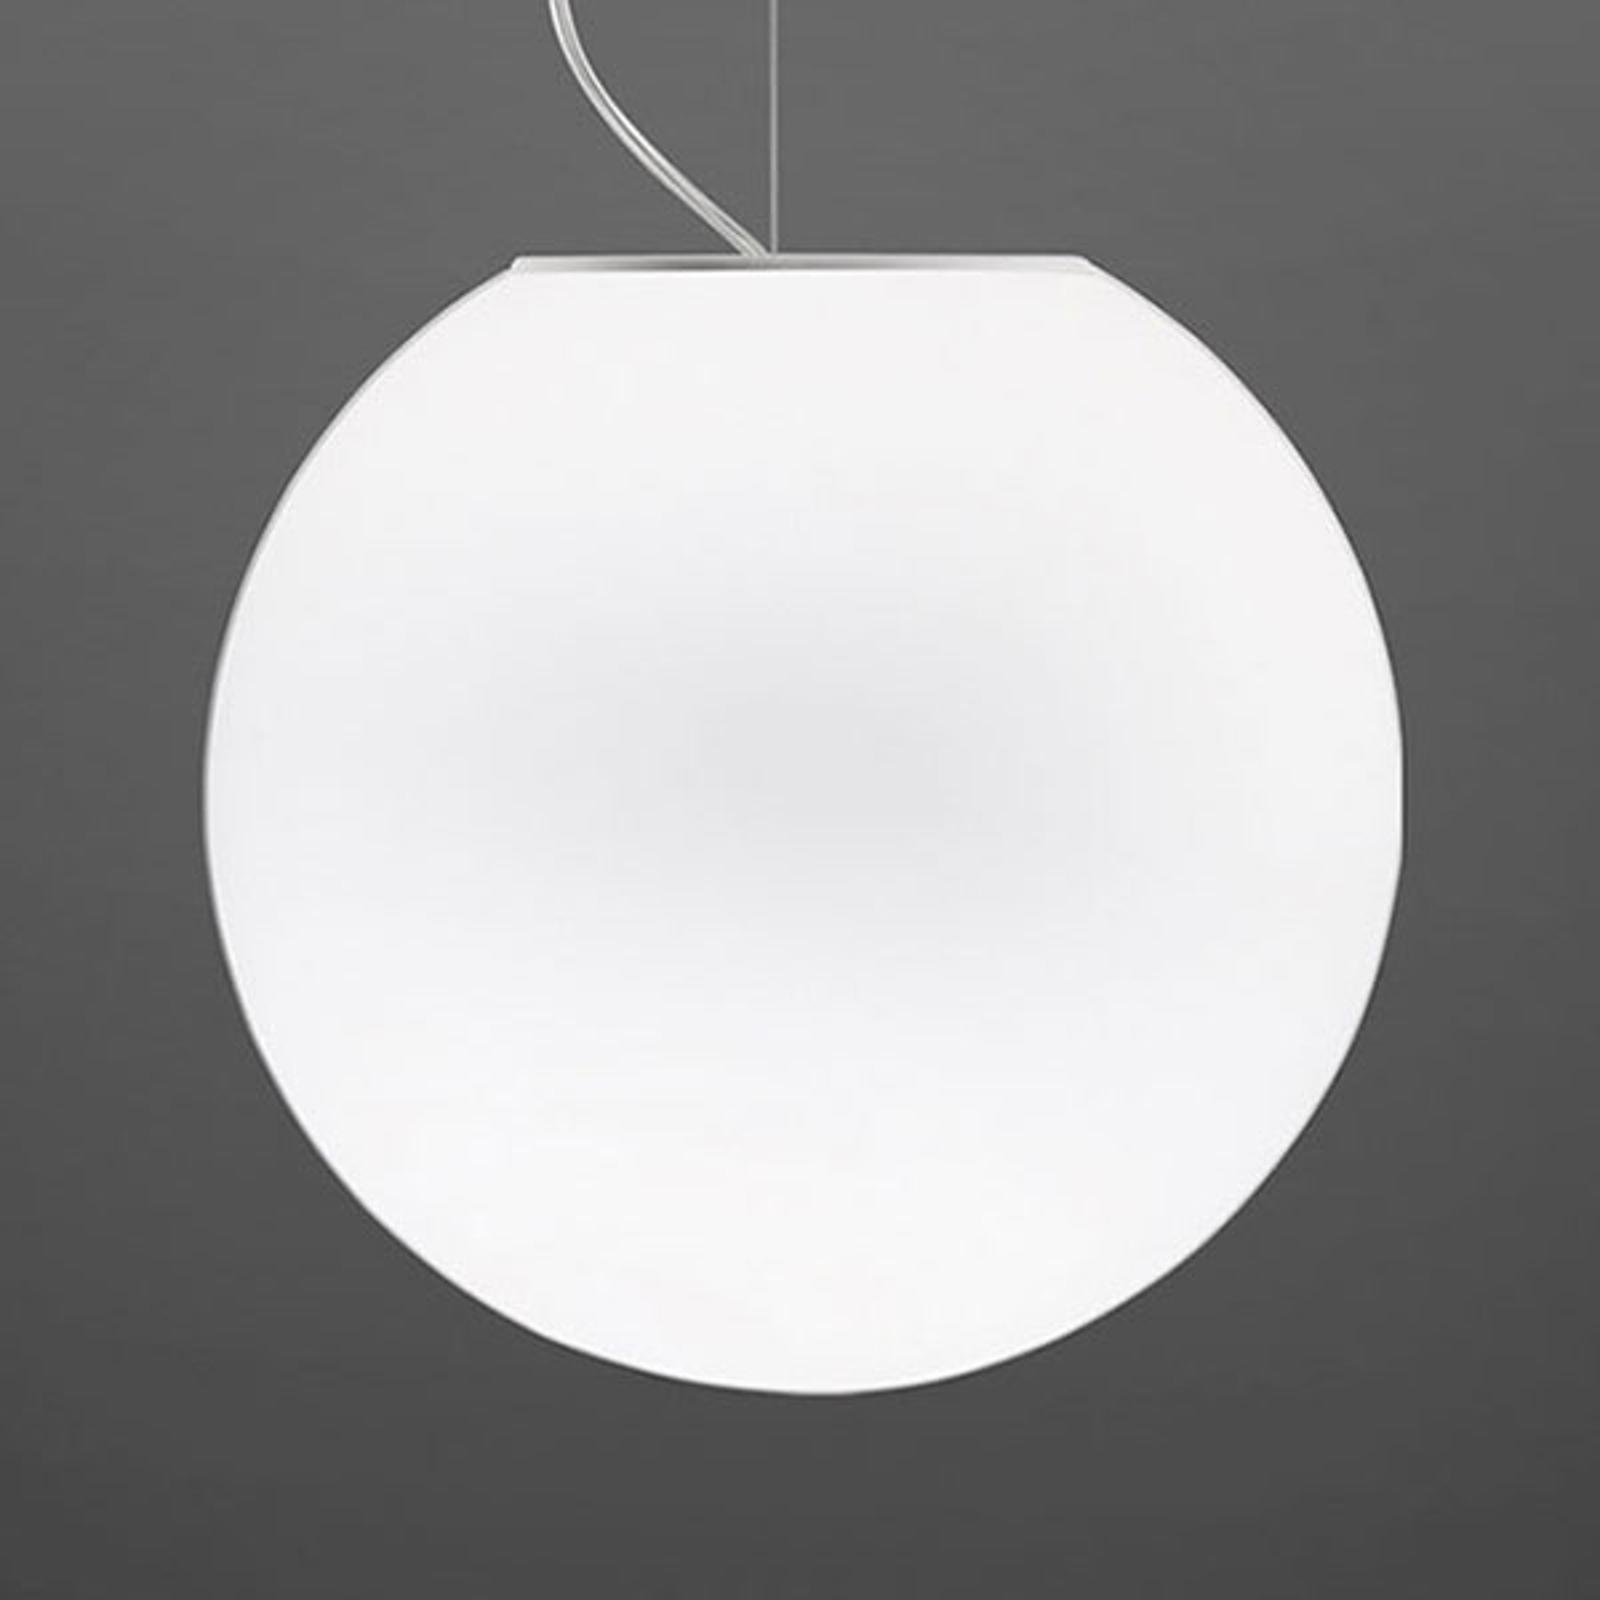 Fabbian Lumi Sfera hengelampe av glass, Ø 40 cm